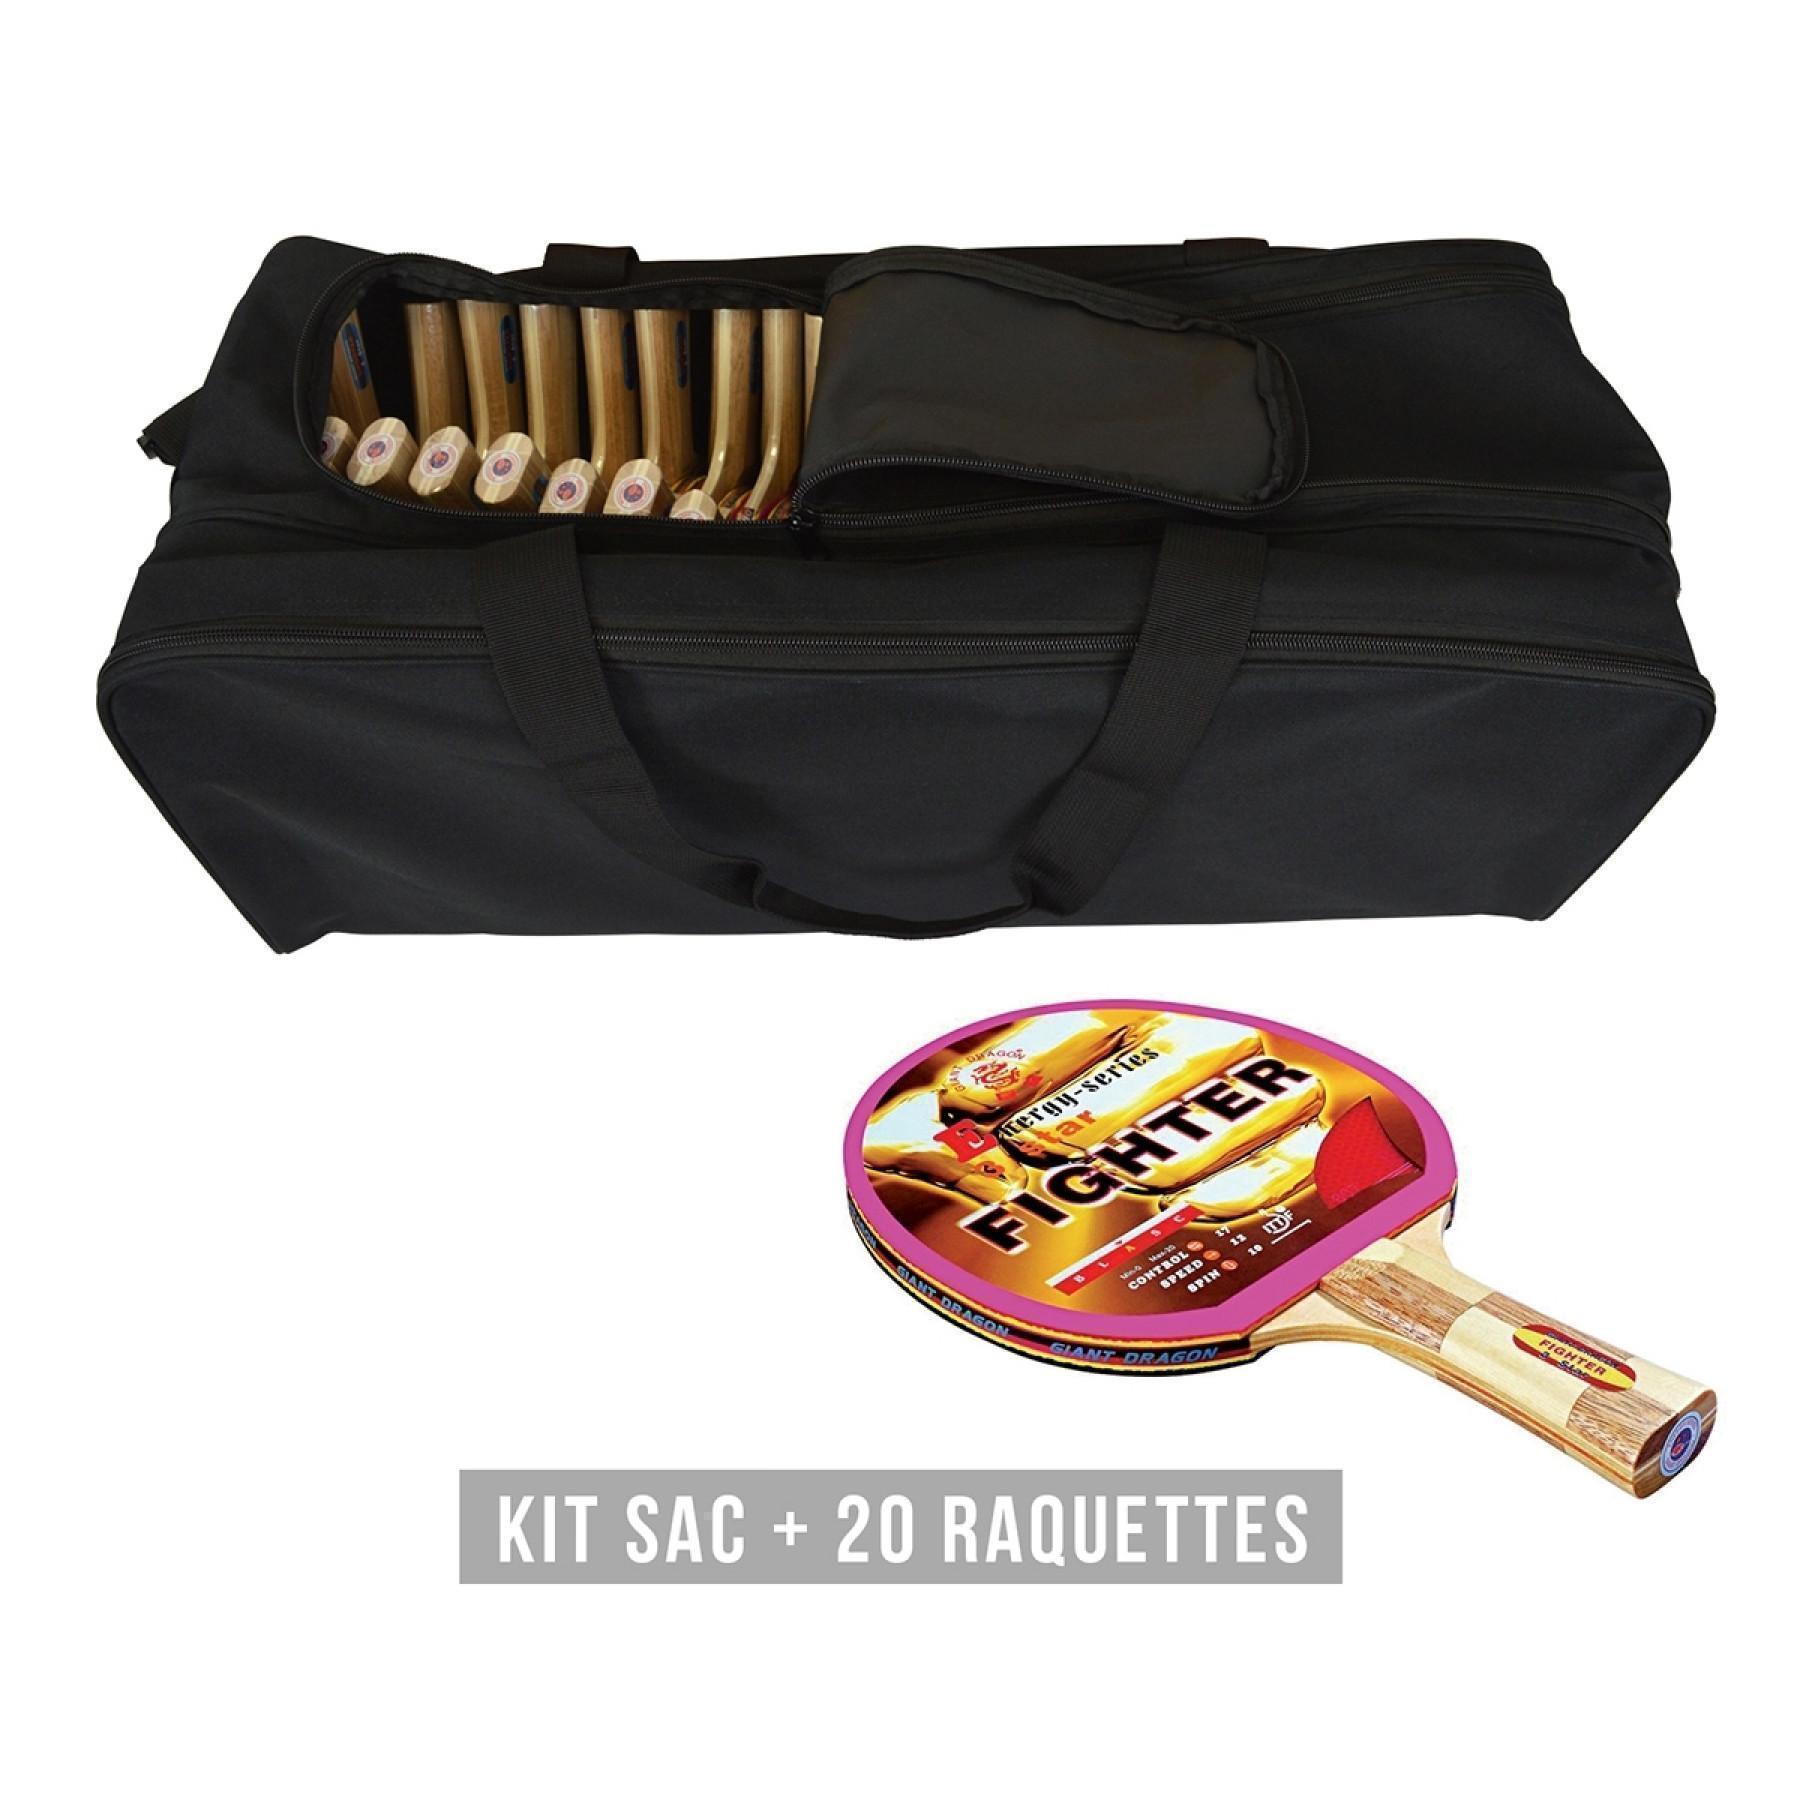 Racket kit (bag + 20 rackets) Sporti France Fighter